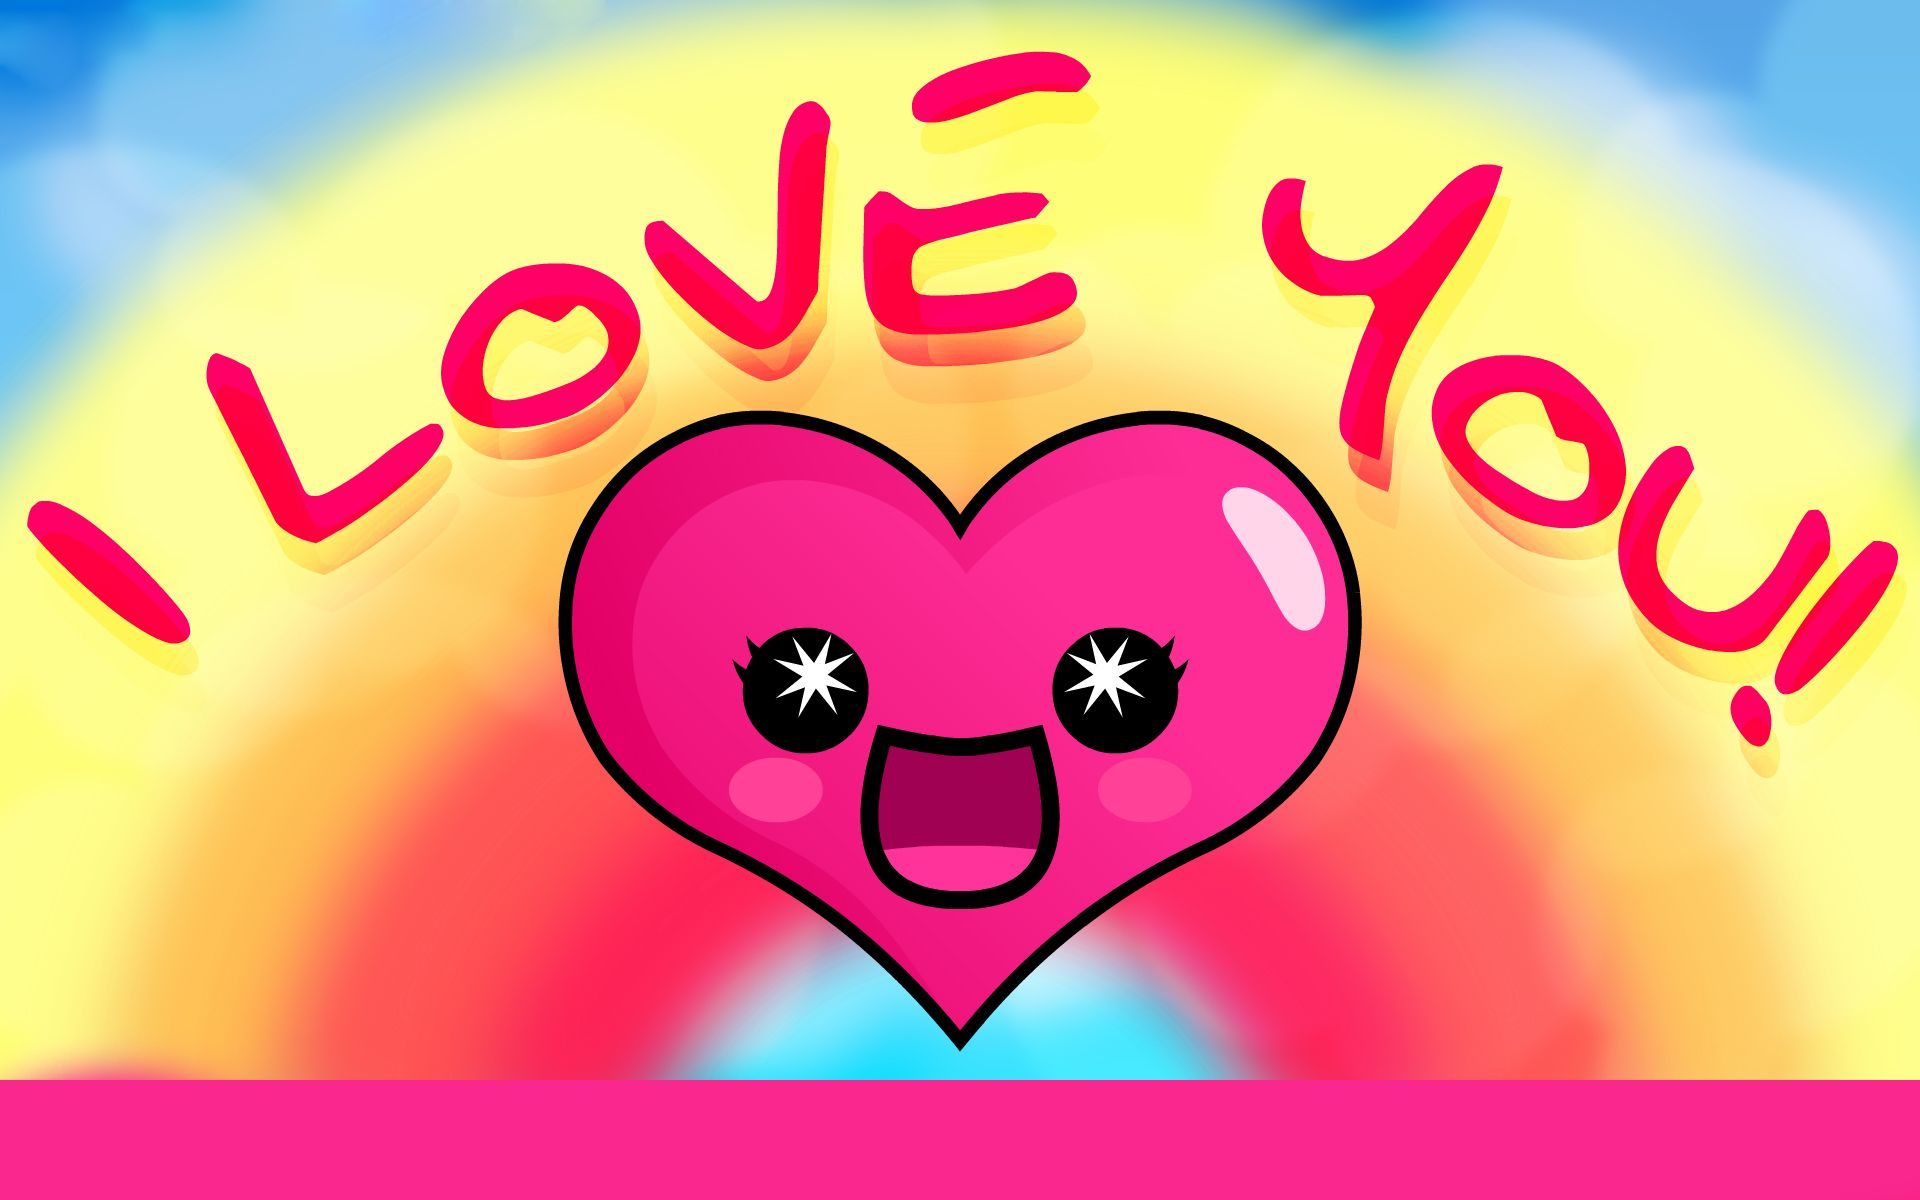 Cool Wallpaper I Love You Cartoon - 163994b02eb5b976c22eac75f4293c24  Pic_113615   .jpg